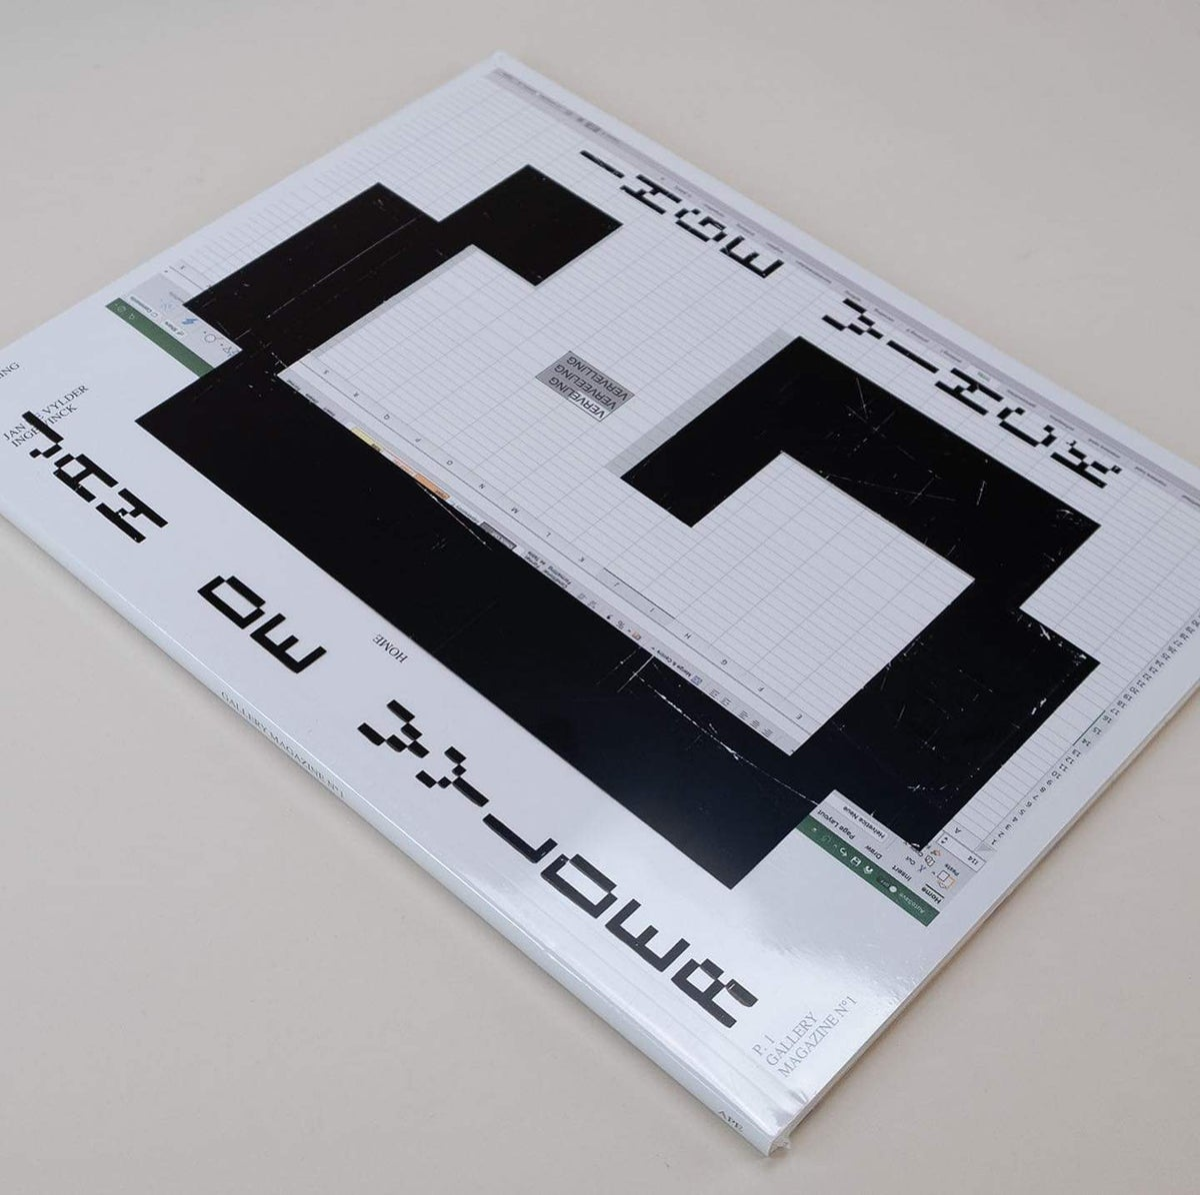 CARROUSEL JOURNEY UNIVERSUM 2 - Flag 24